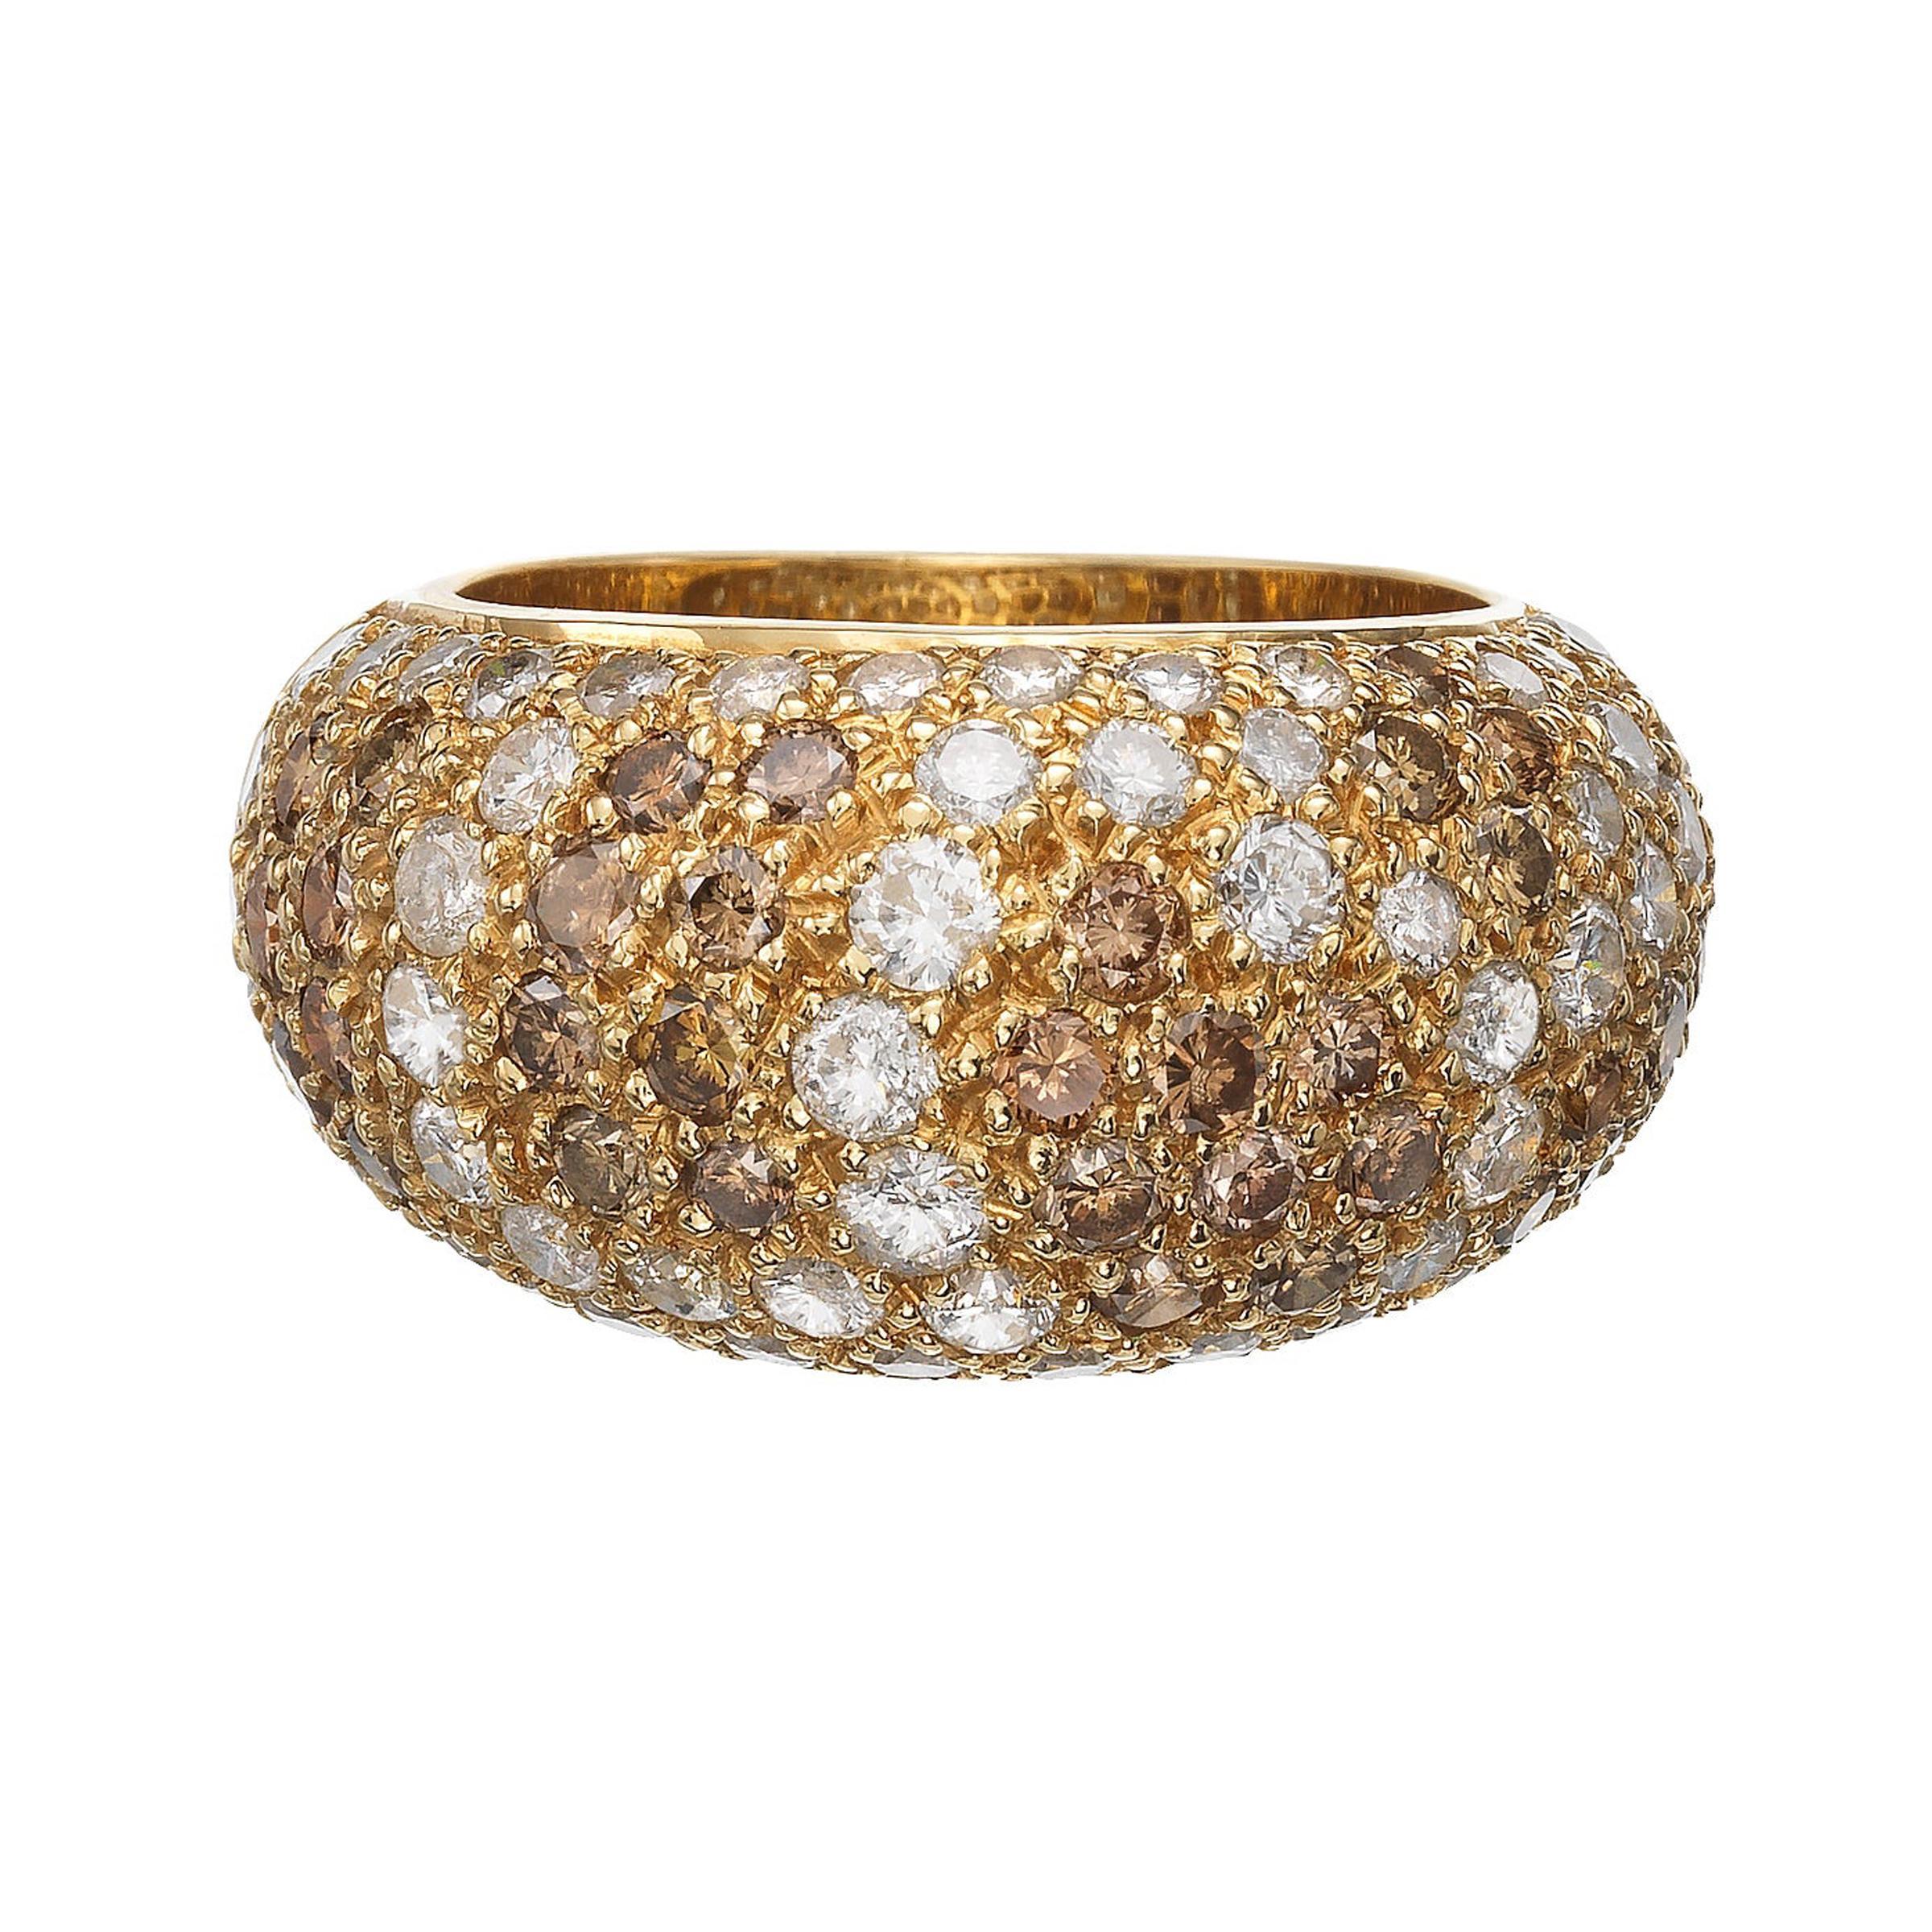 Cartier Vintage Diamond and 18 Karat Gold Bombe Ring